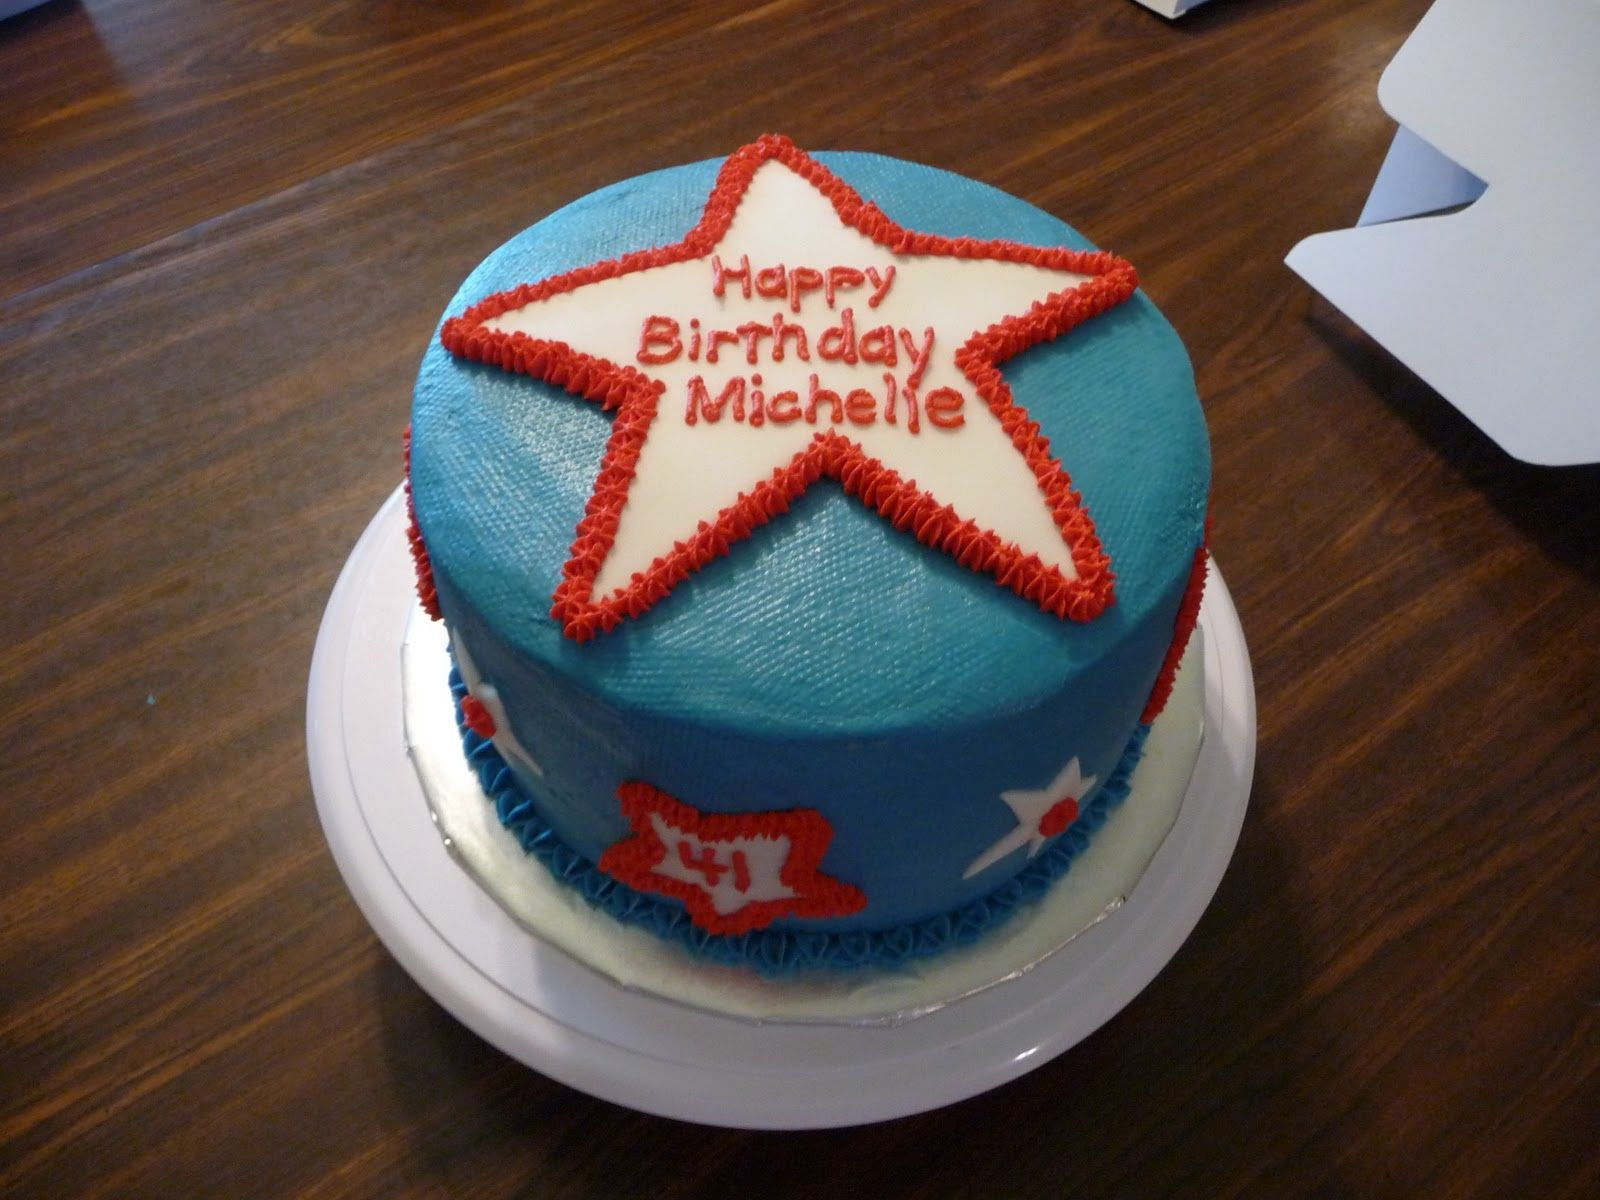 Birthday Cakes With Name Sudha ~ Pin by prerna arora on happy birthday names happy